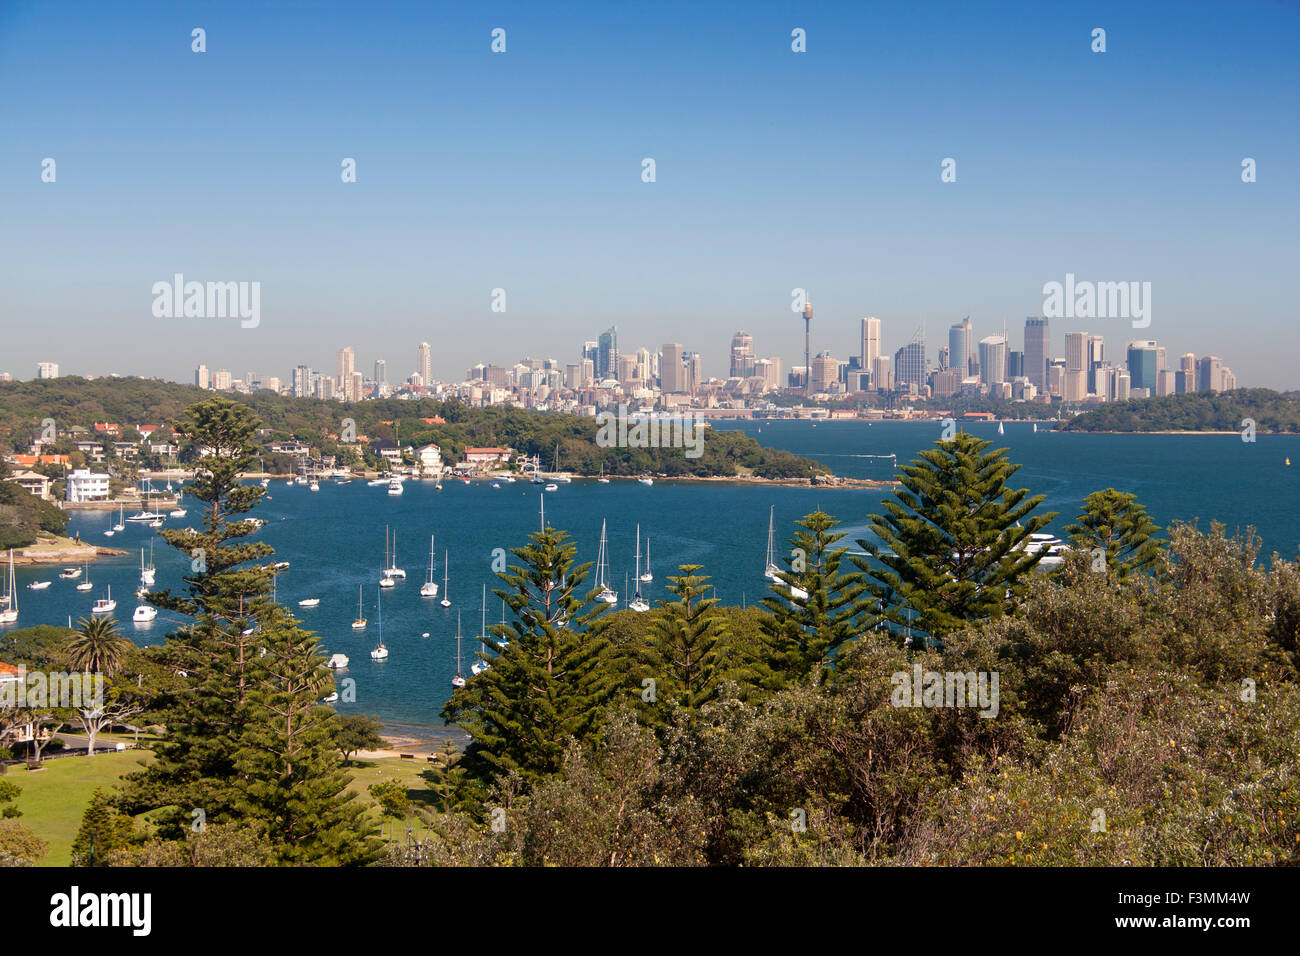 Watsons Bay view to city CBD skyscrapers skyline Eastern Suburbs Sydney New South Wales NSW Australia - Stock Image